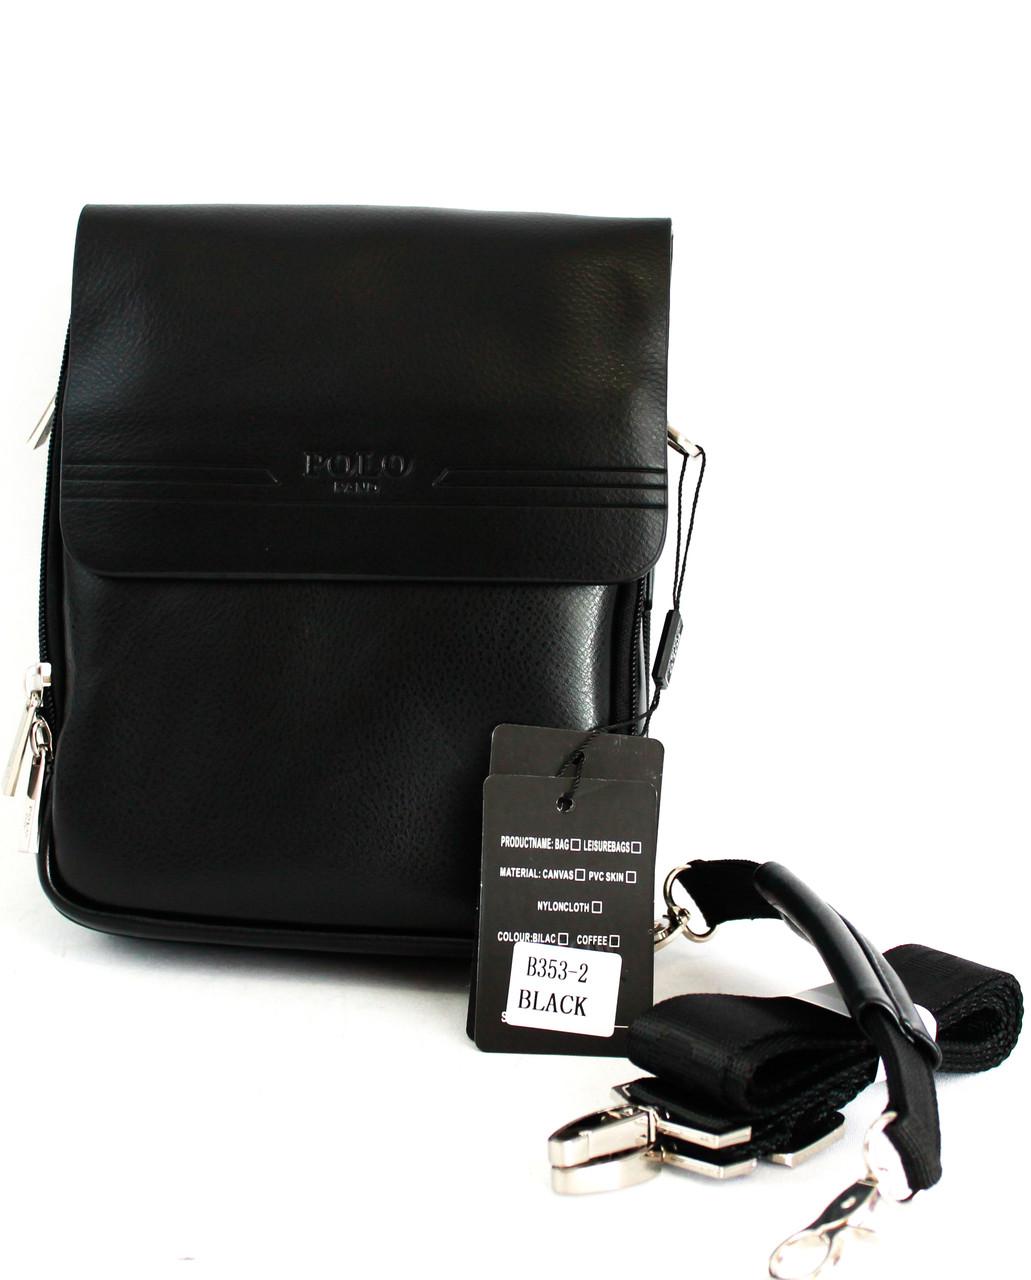 Стильная сумка для мужчин из кожзама Polo B353-2